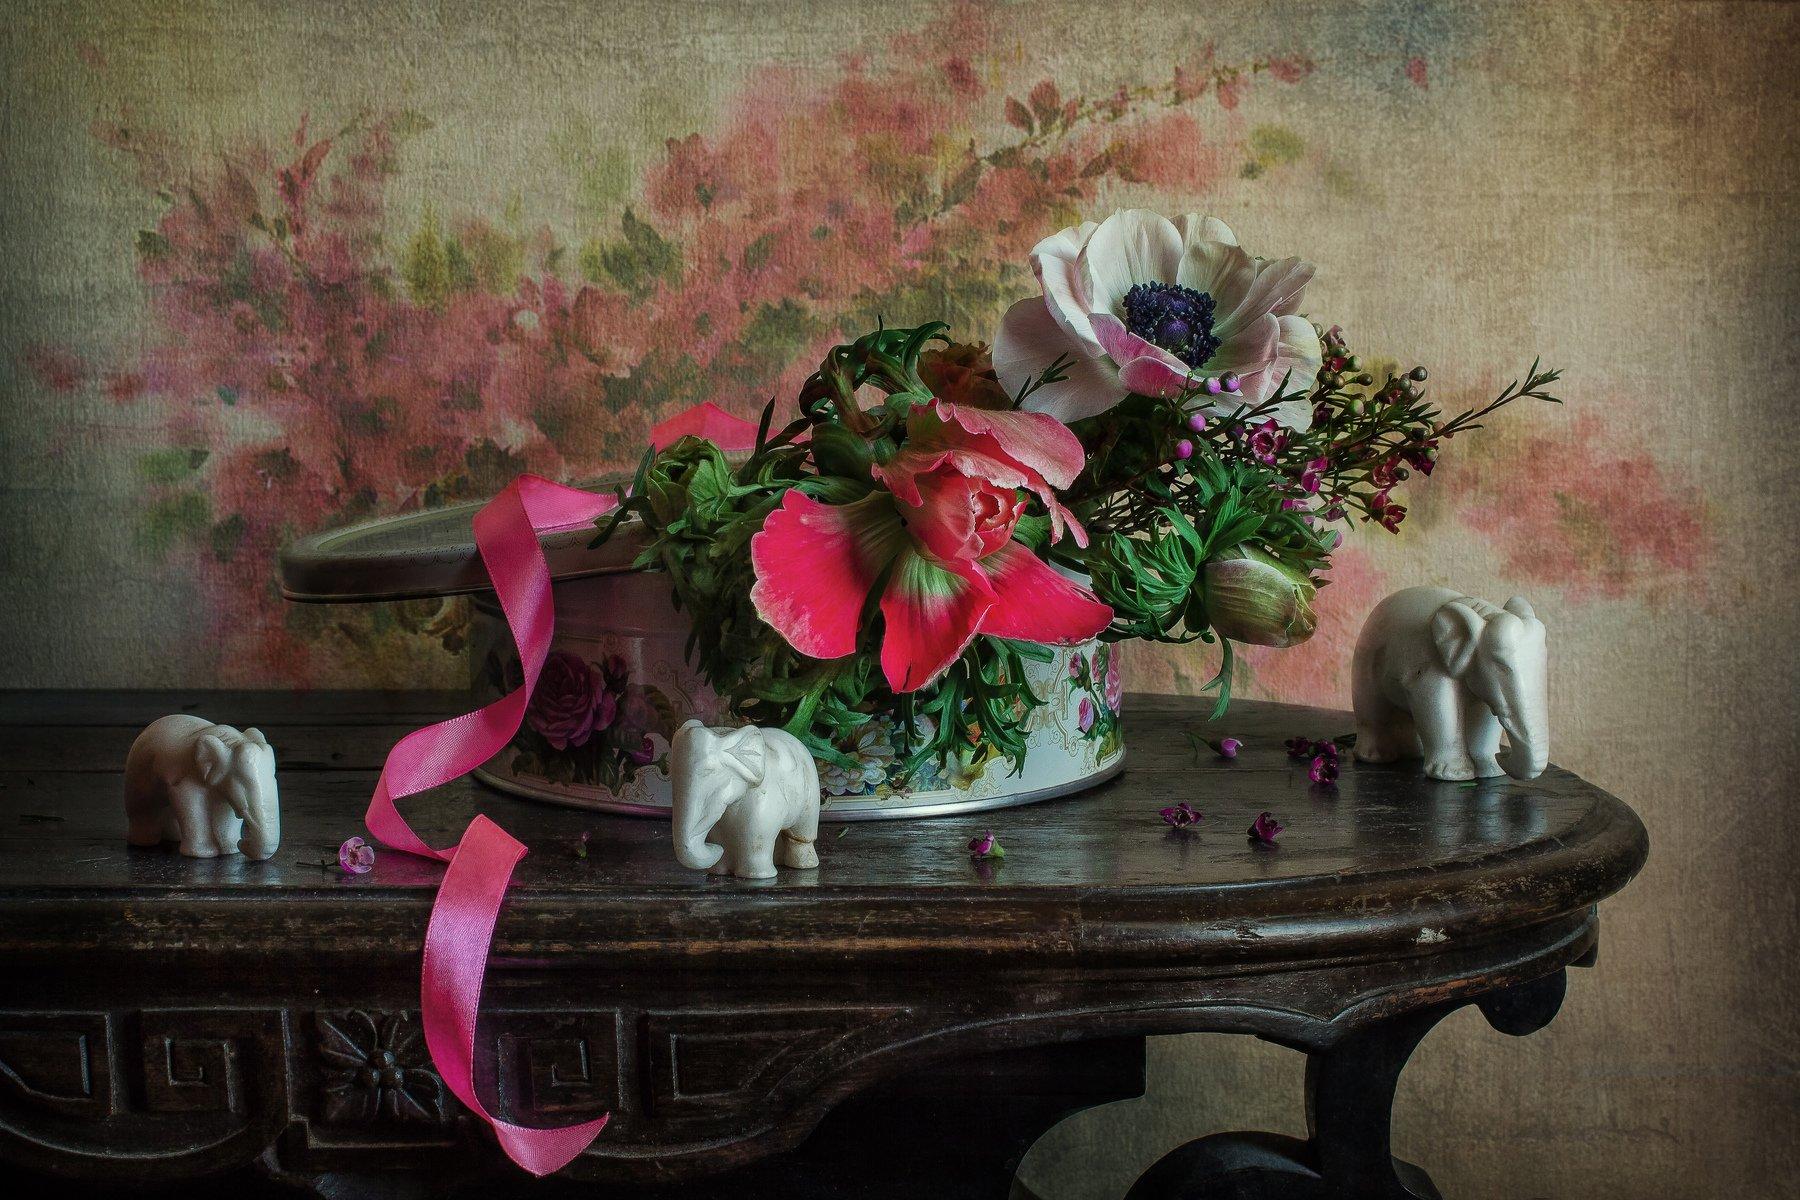 натюрморт, цветы, анемоны, статуэтка, слон, Анна Петина